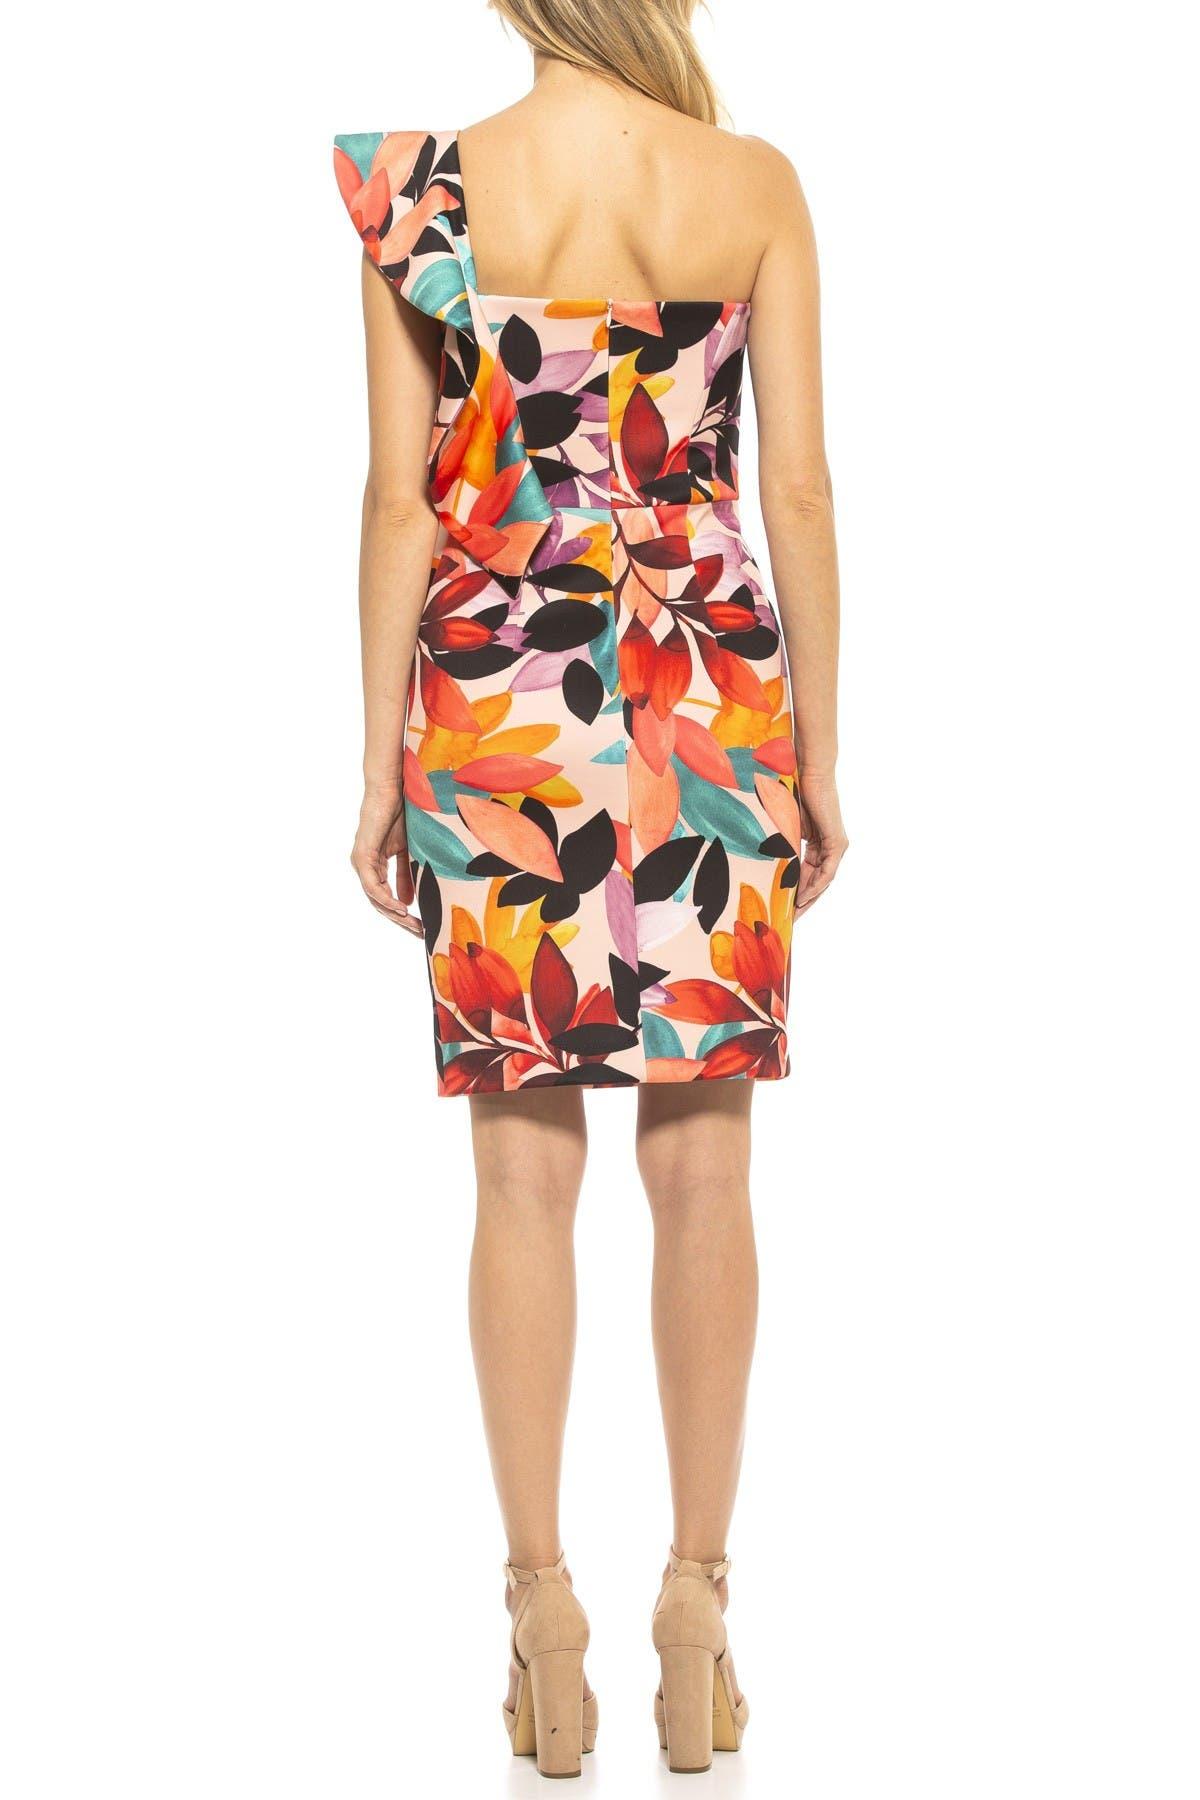 Image of Alexia Admor Victoria One Shoulder Ruffle Sleeve Dress